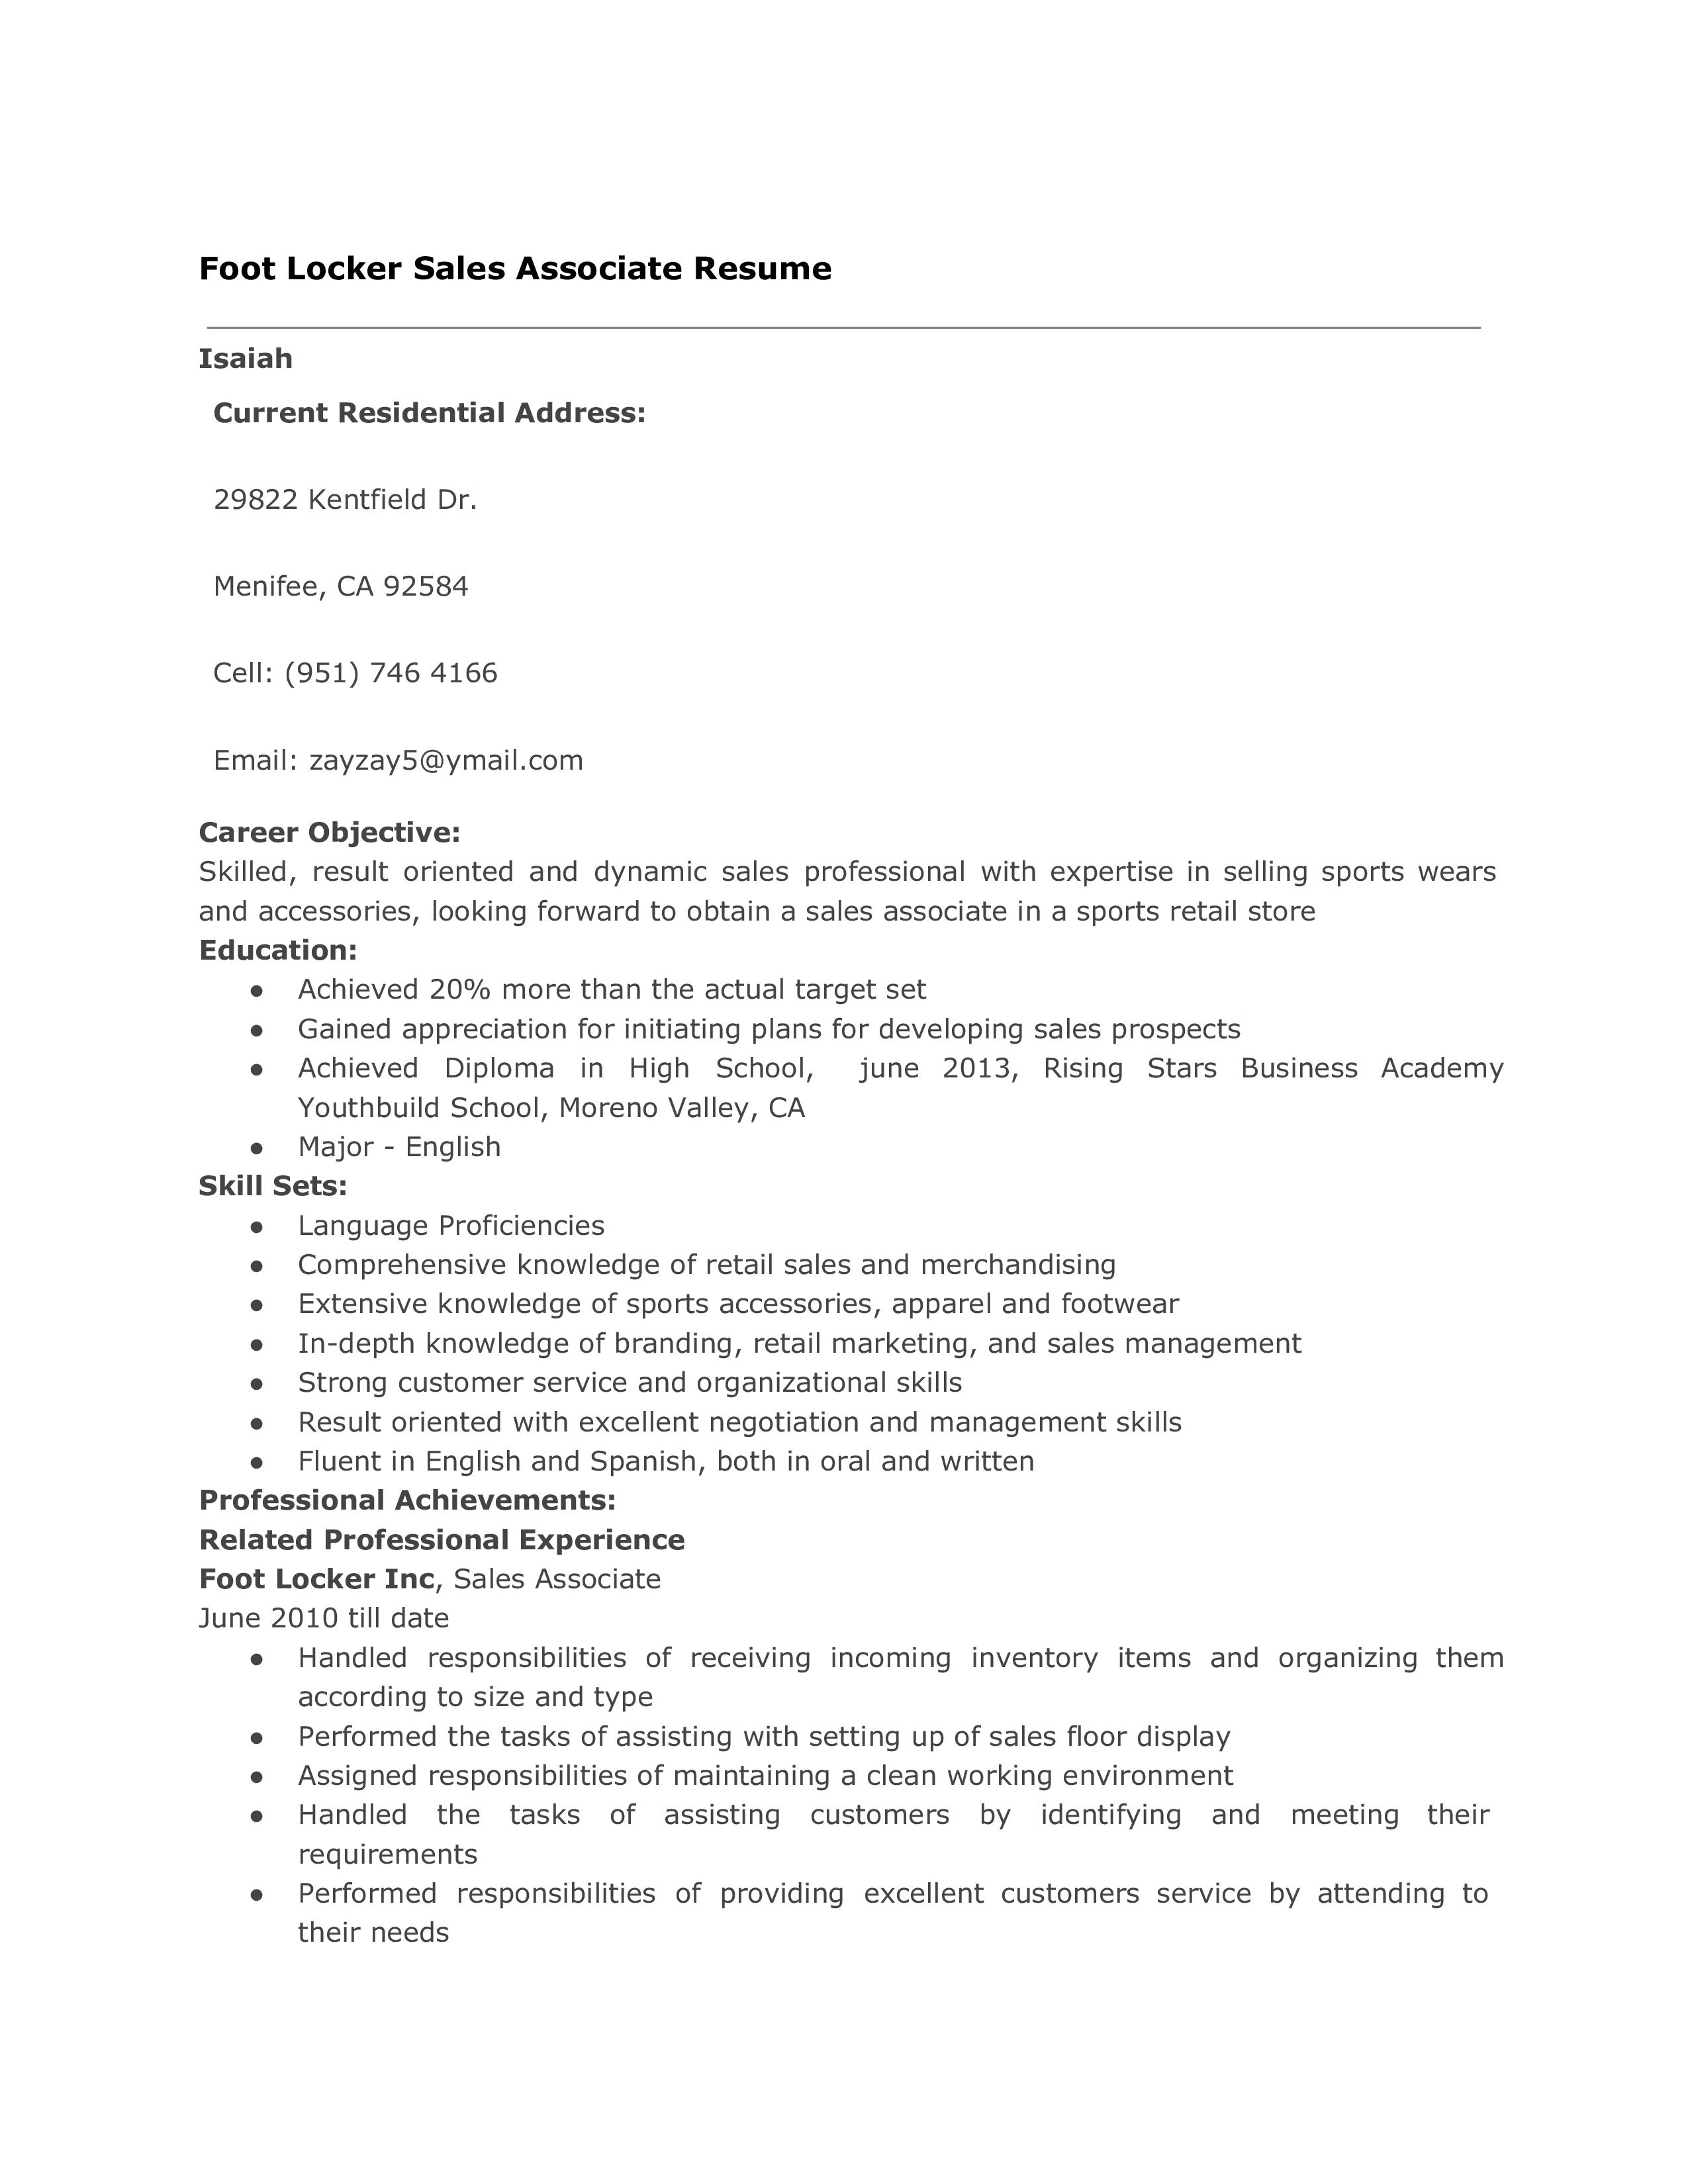 Professional Sales Associate Resume